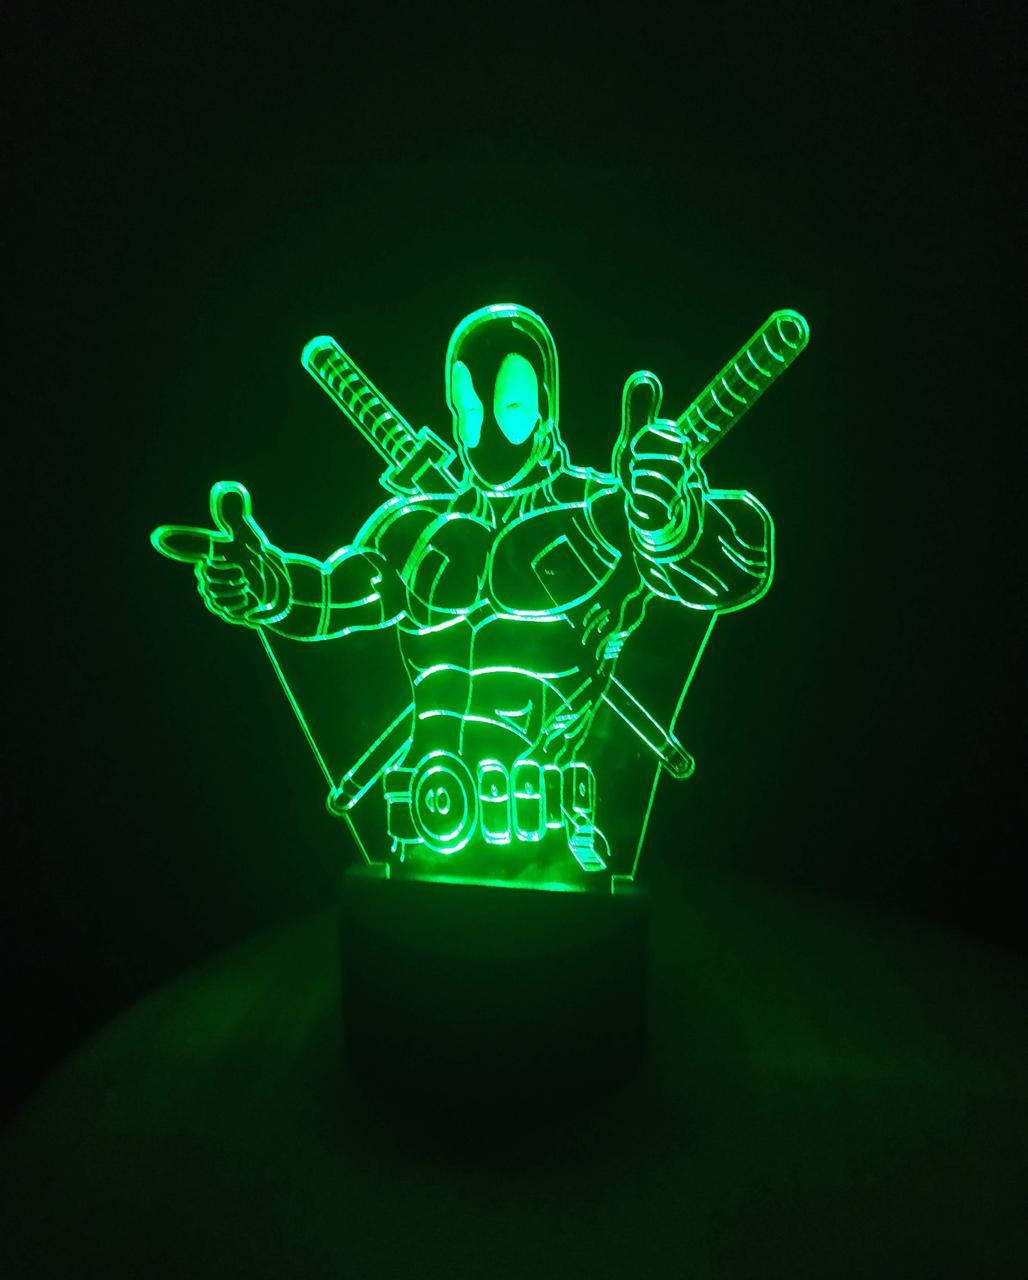 3d-светильник Дэдпул, 3д-ночник, несколько подсветок (на батарейке)